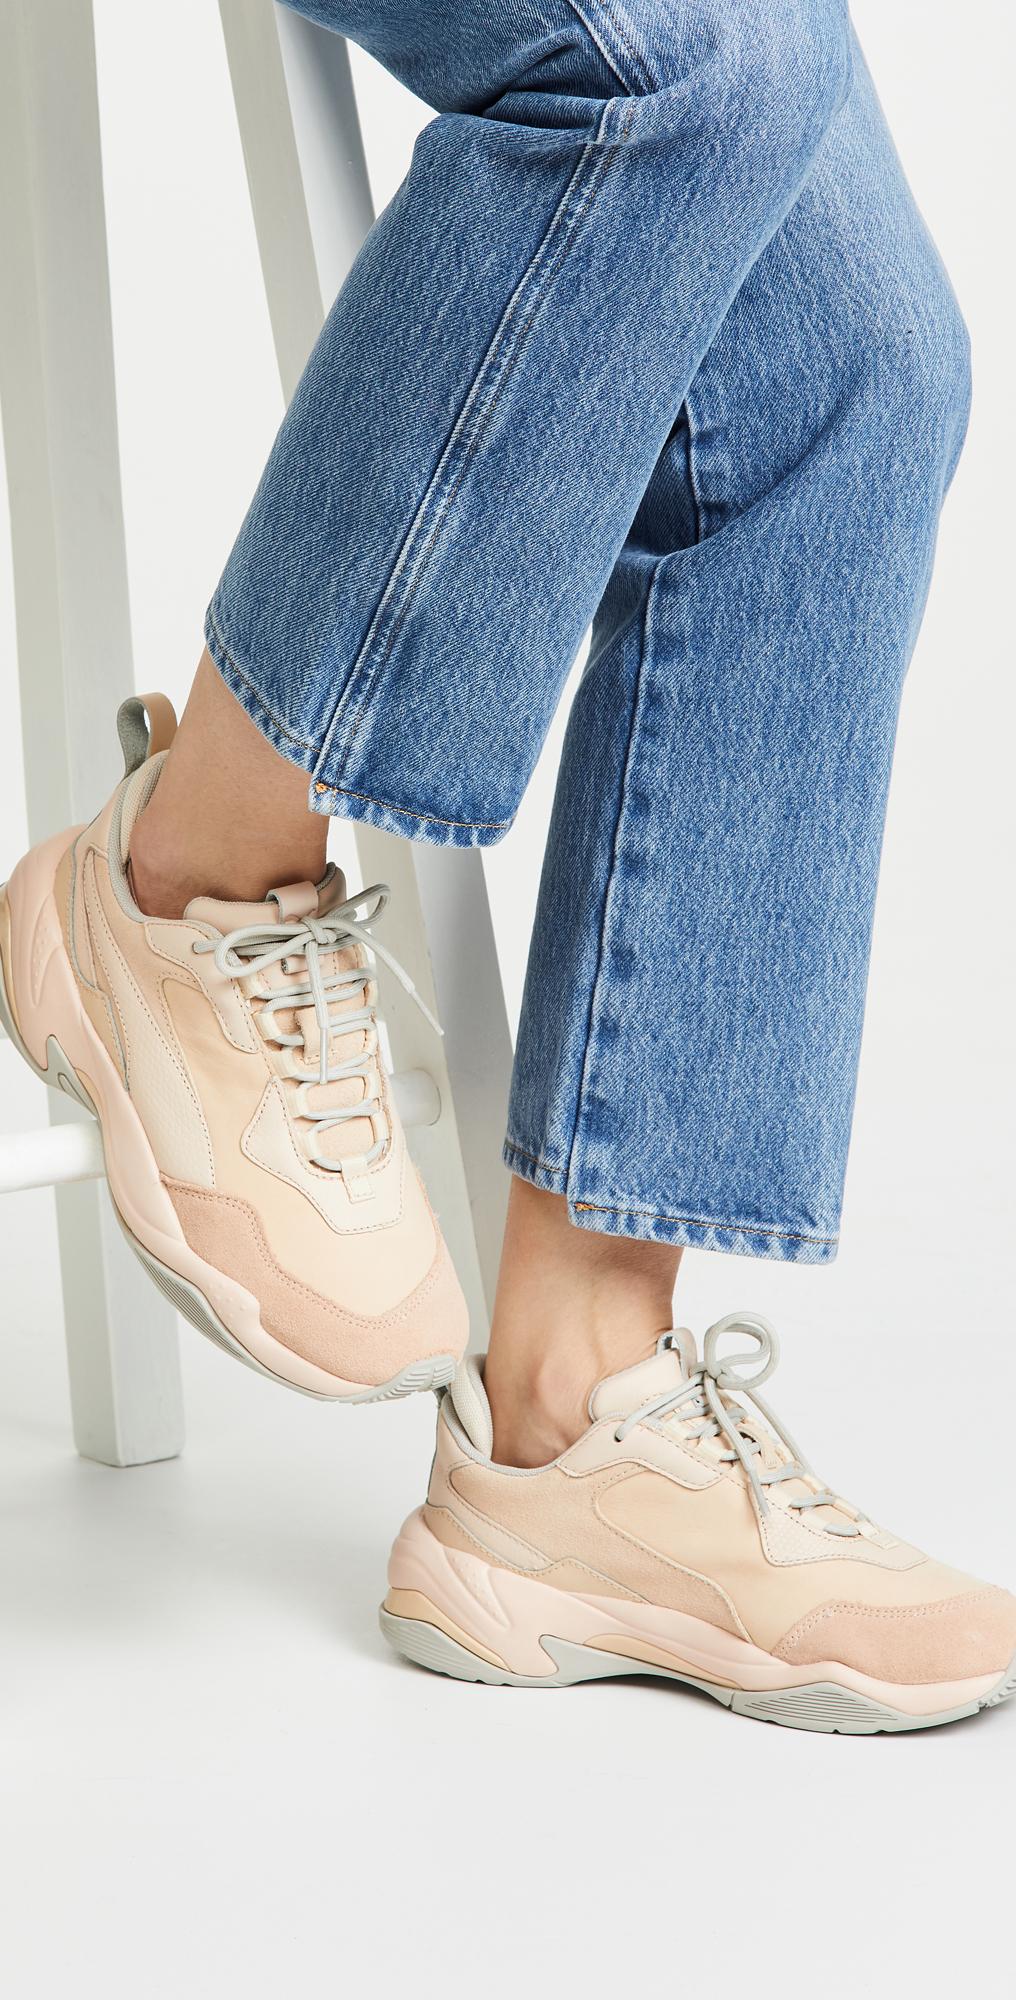 PUMA Thunder Desert 运动鞋| SHOPBOP